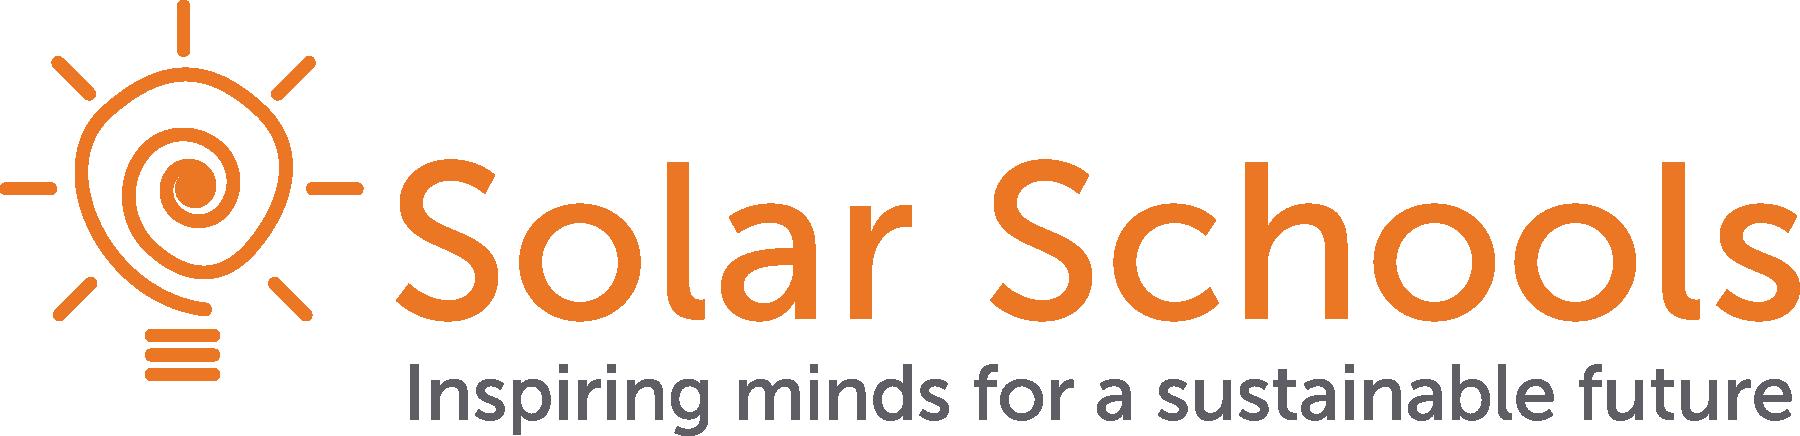 ss_logo_tagline.png